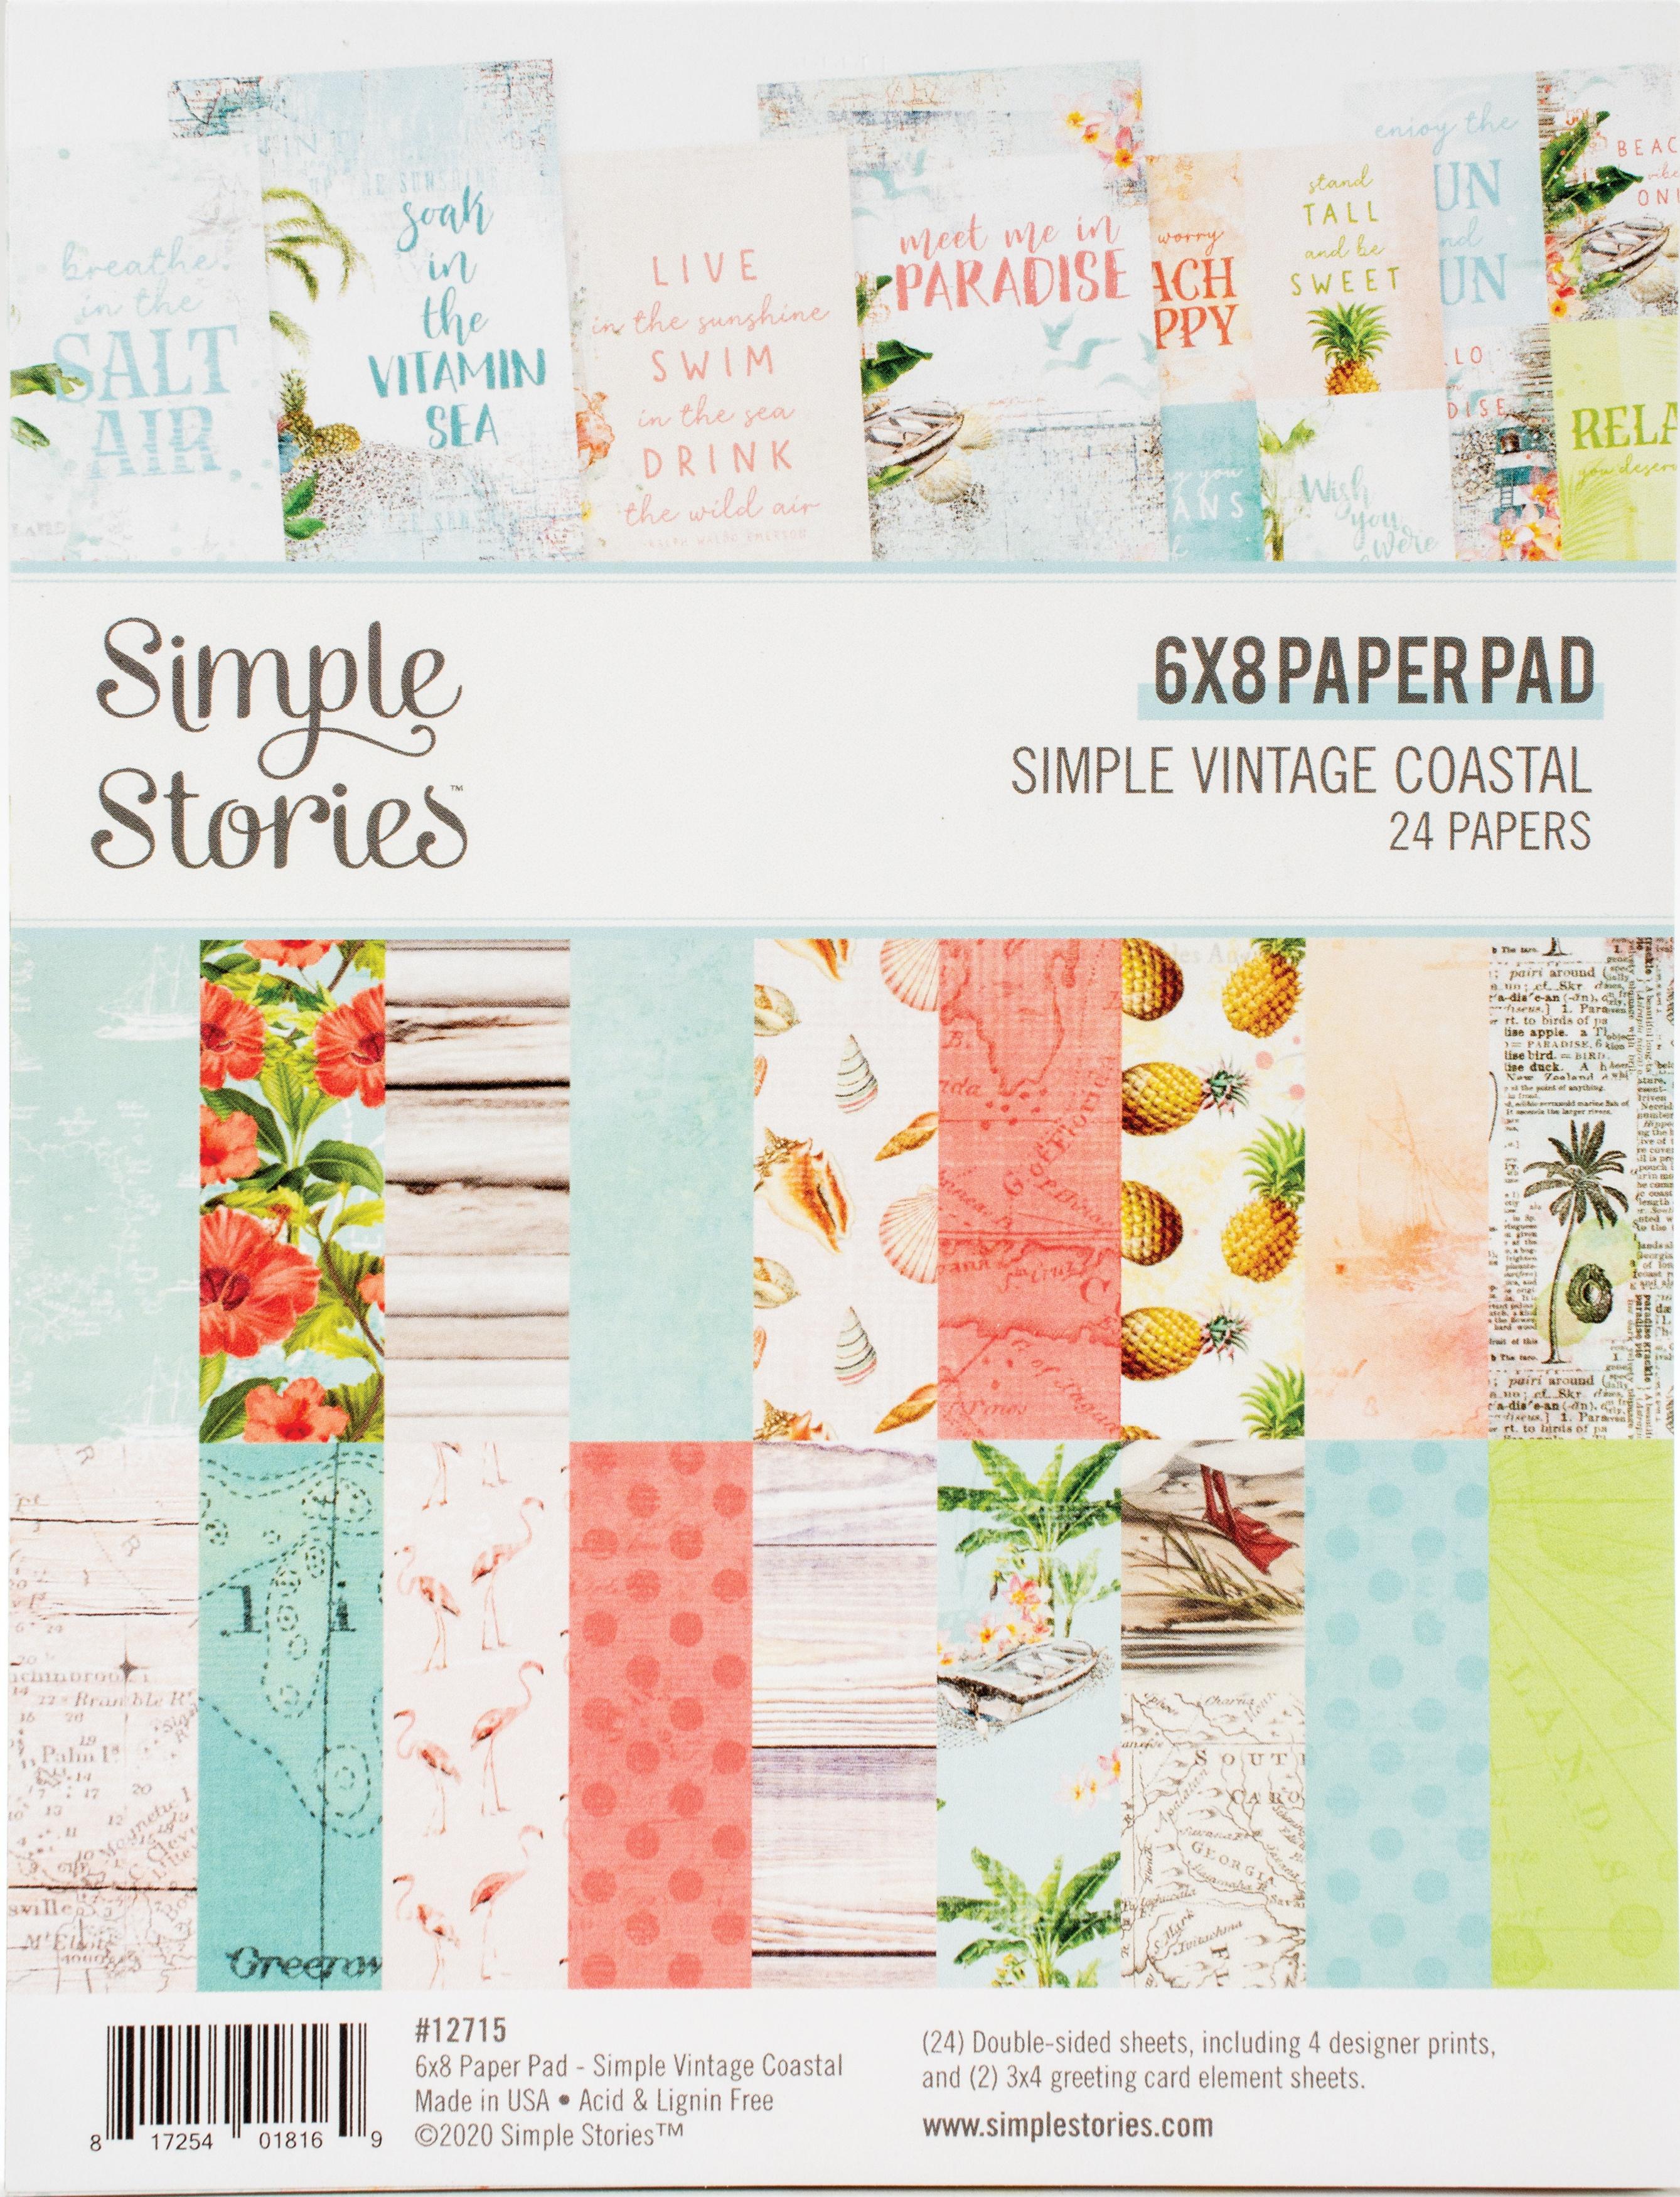 Simple Stories Double-Sided Paper Pad 6X8 24/Pkg-Simple Vintage Coastal